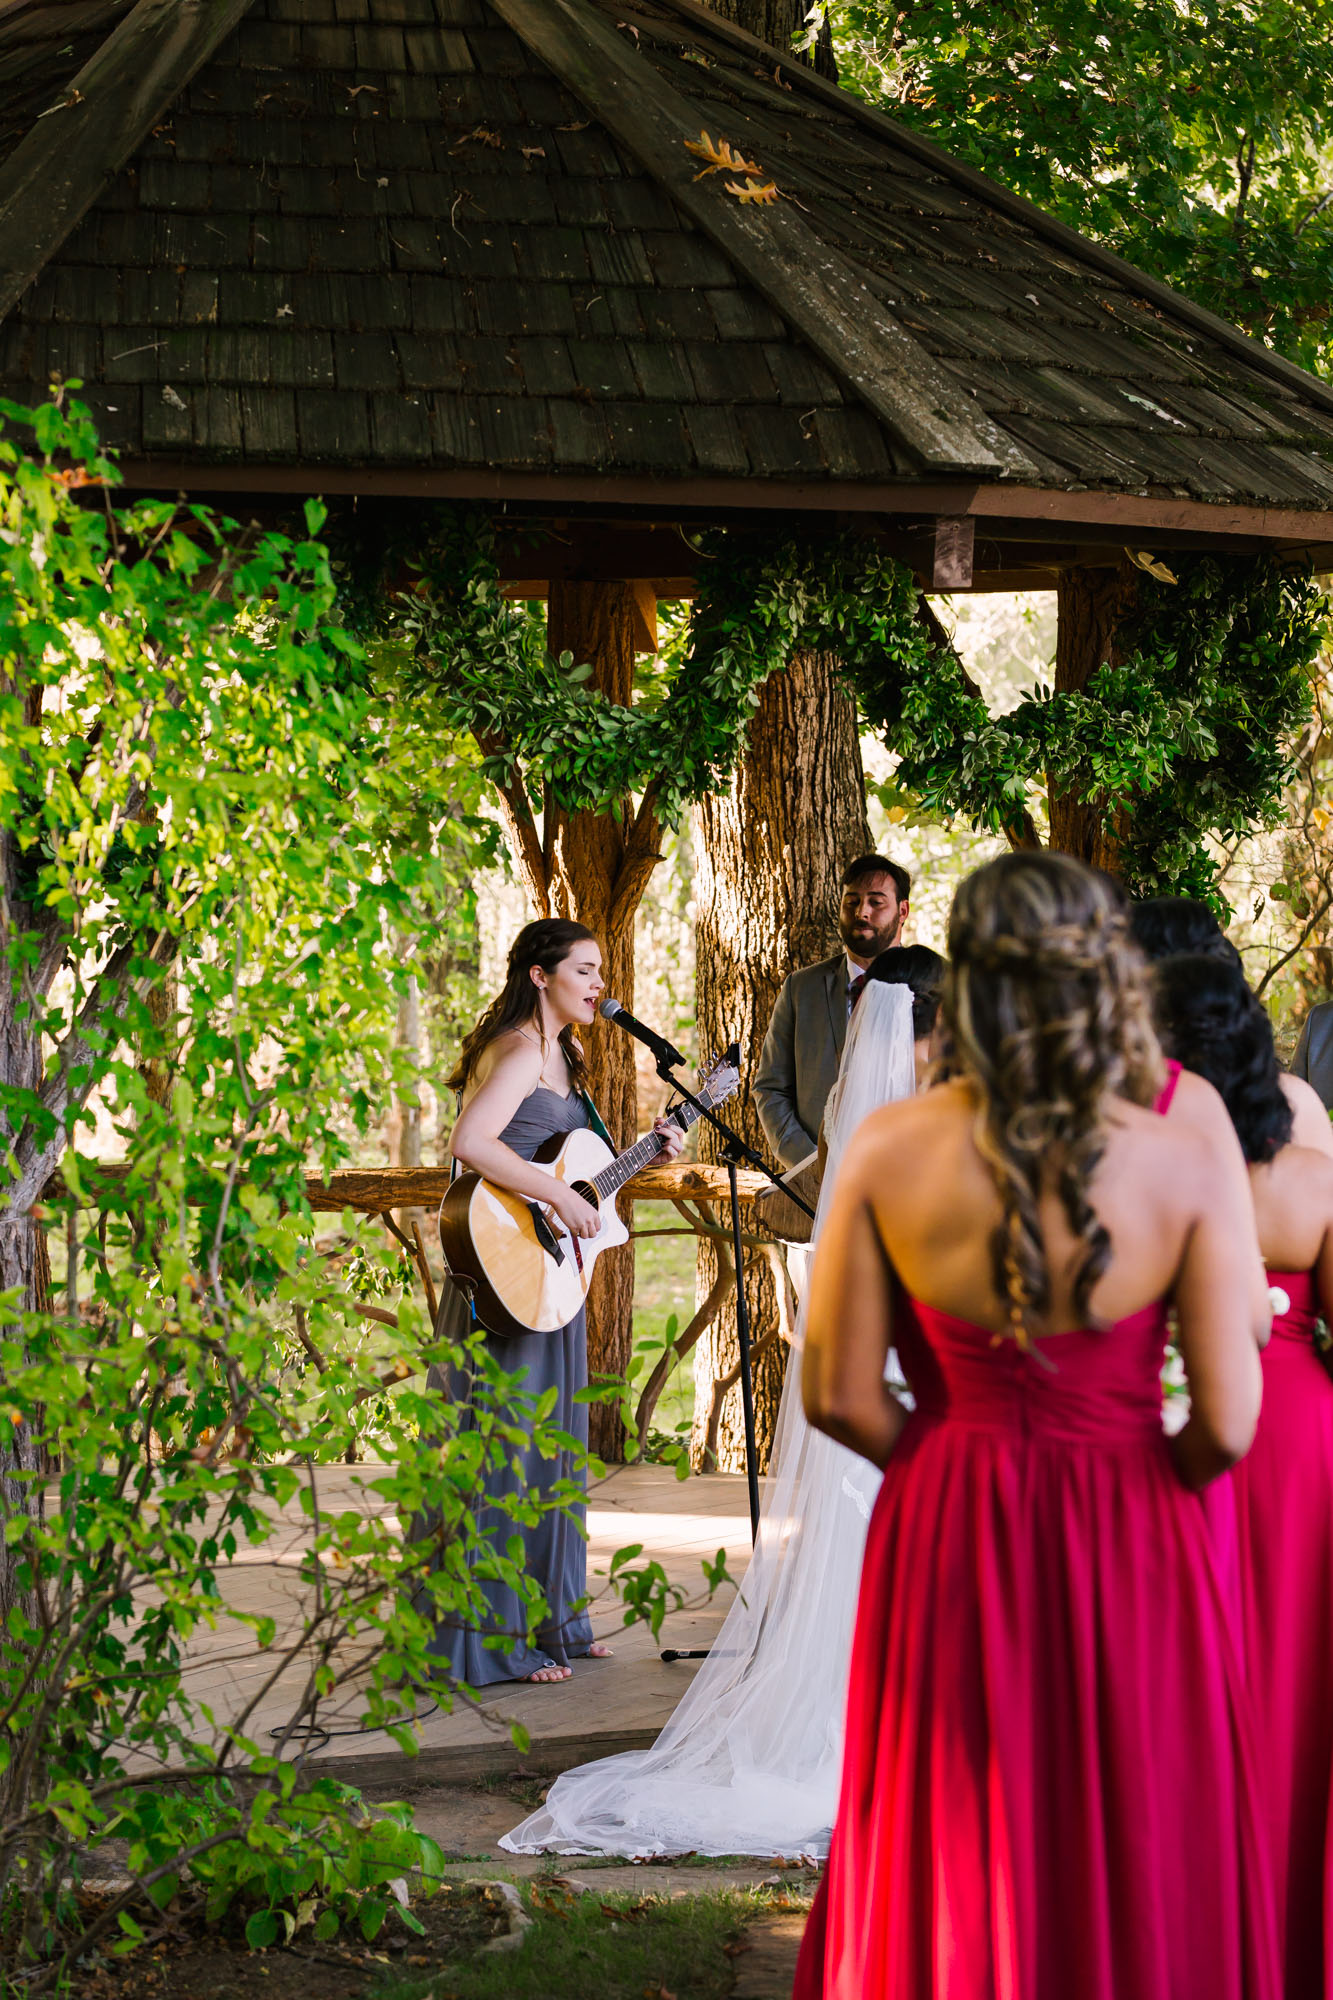 Waynesville NC Wedding Photography | Wedding Ceremony family member singing